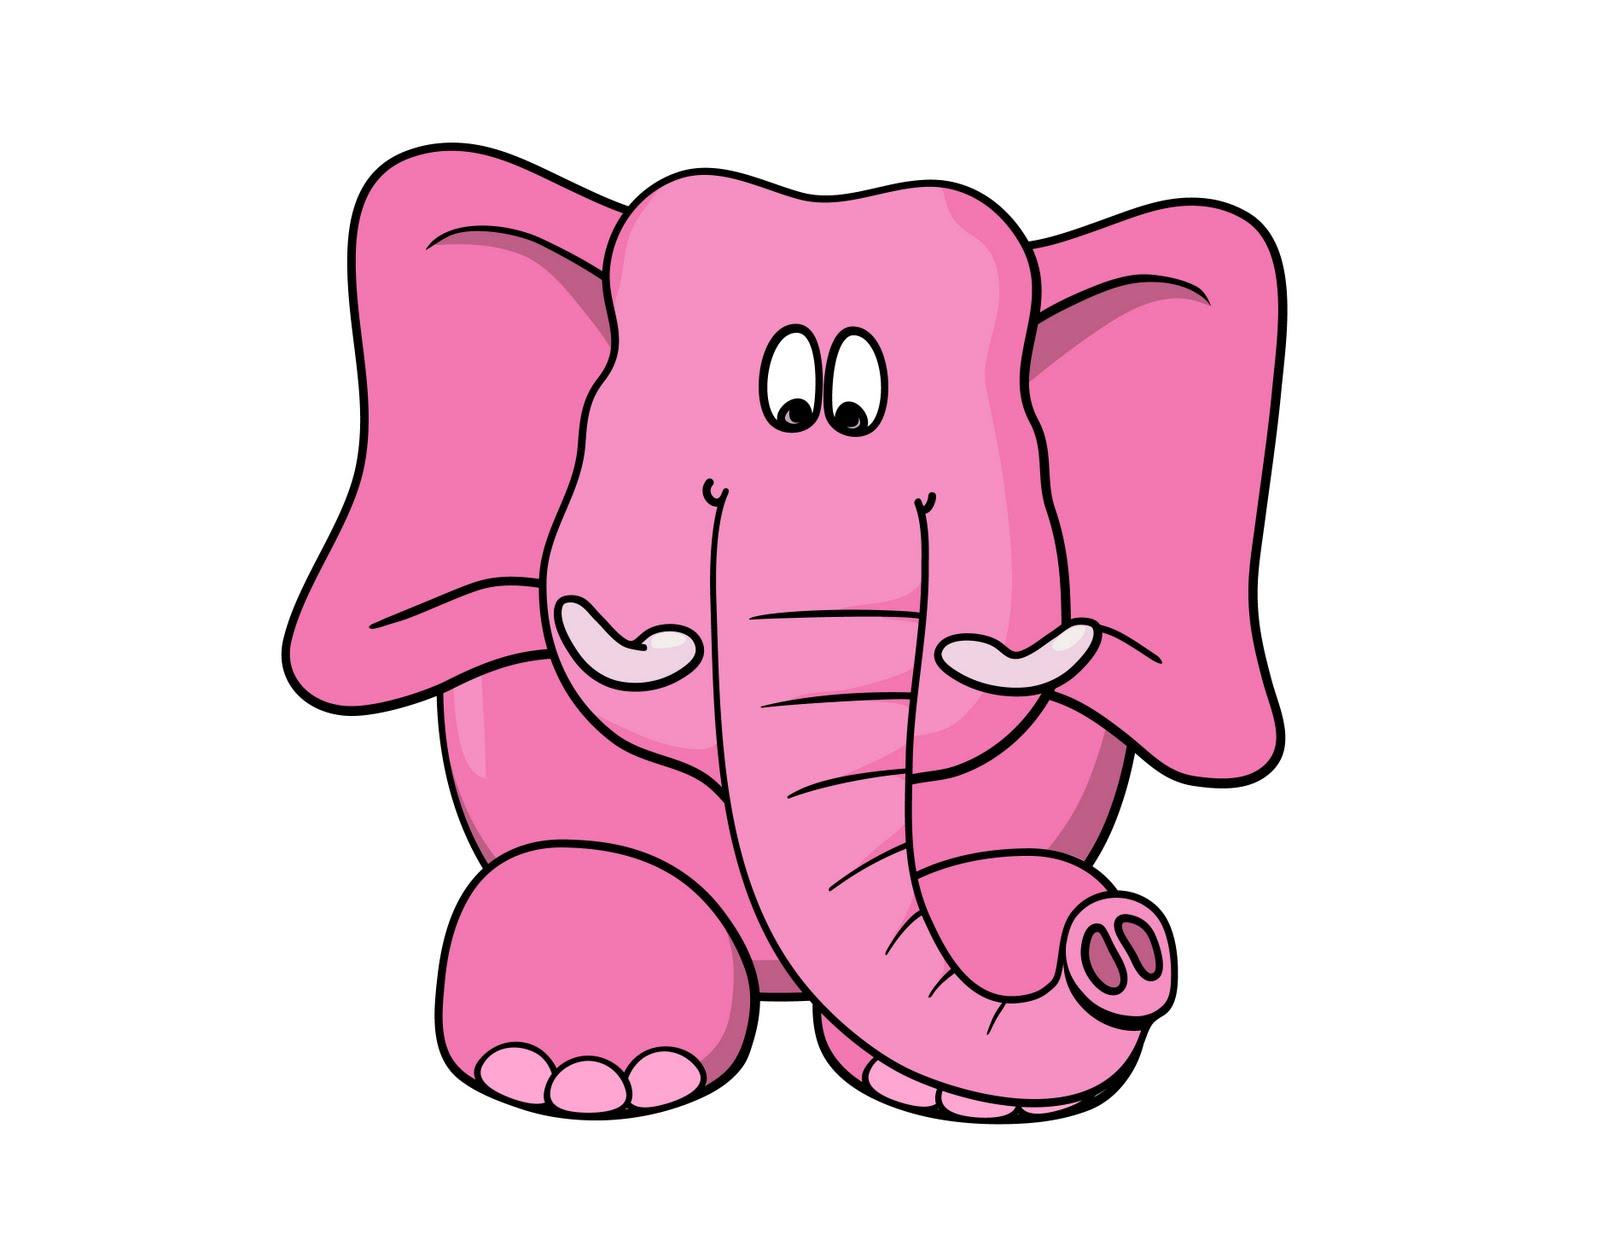 Desktop pictures of elephants cartoon dowload 3d hd picture design ...